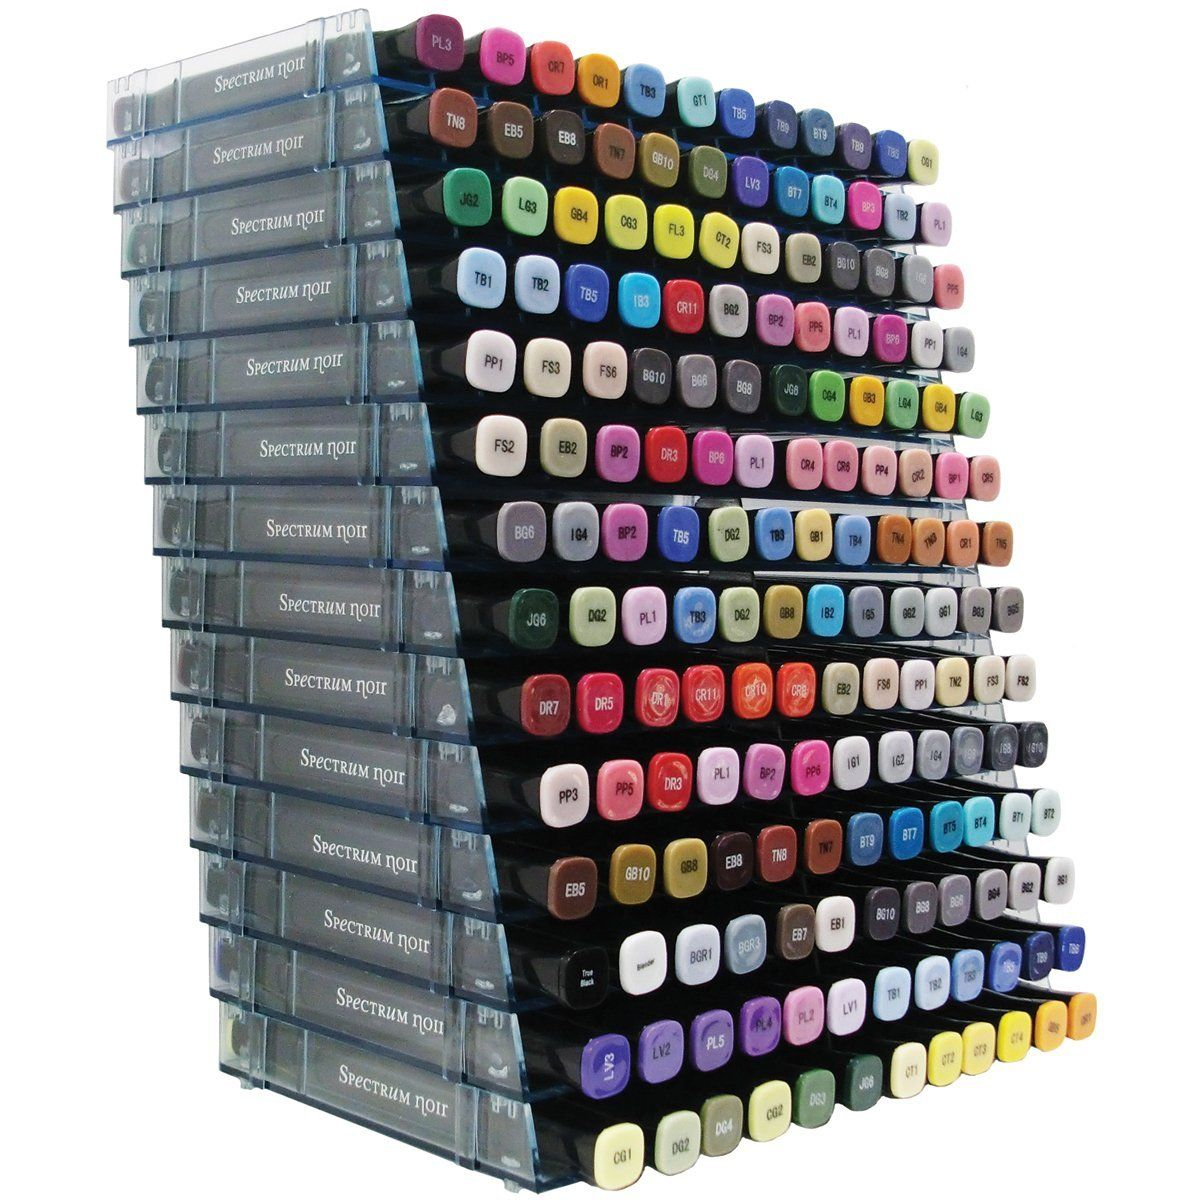 Crafters Companion Spectrum Noir Marker Storage Trays Black